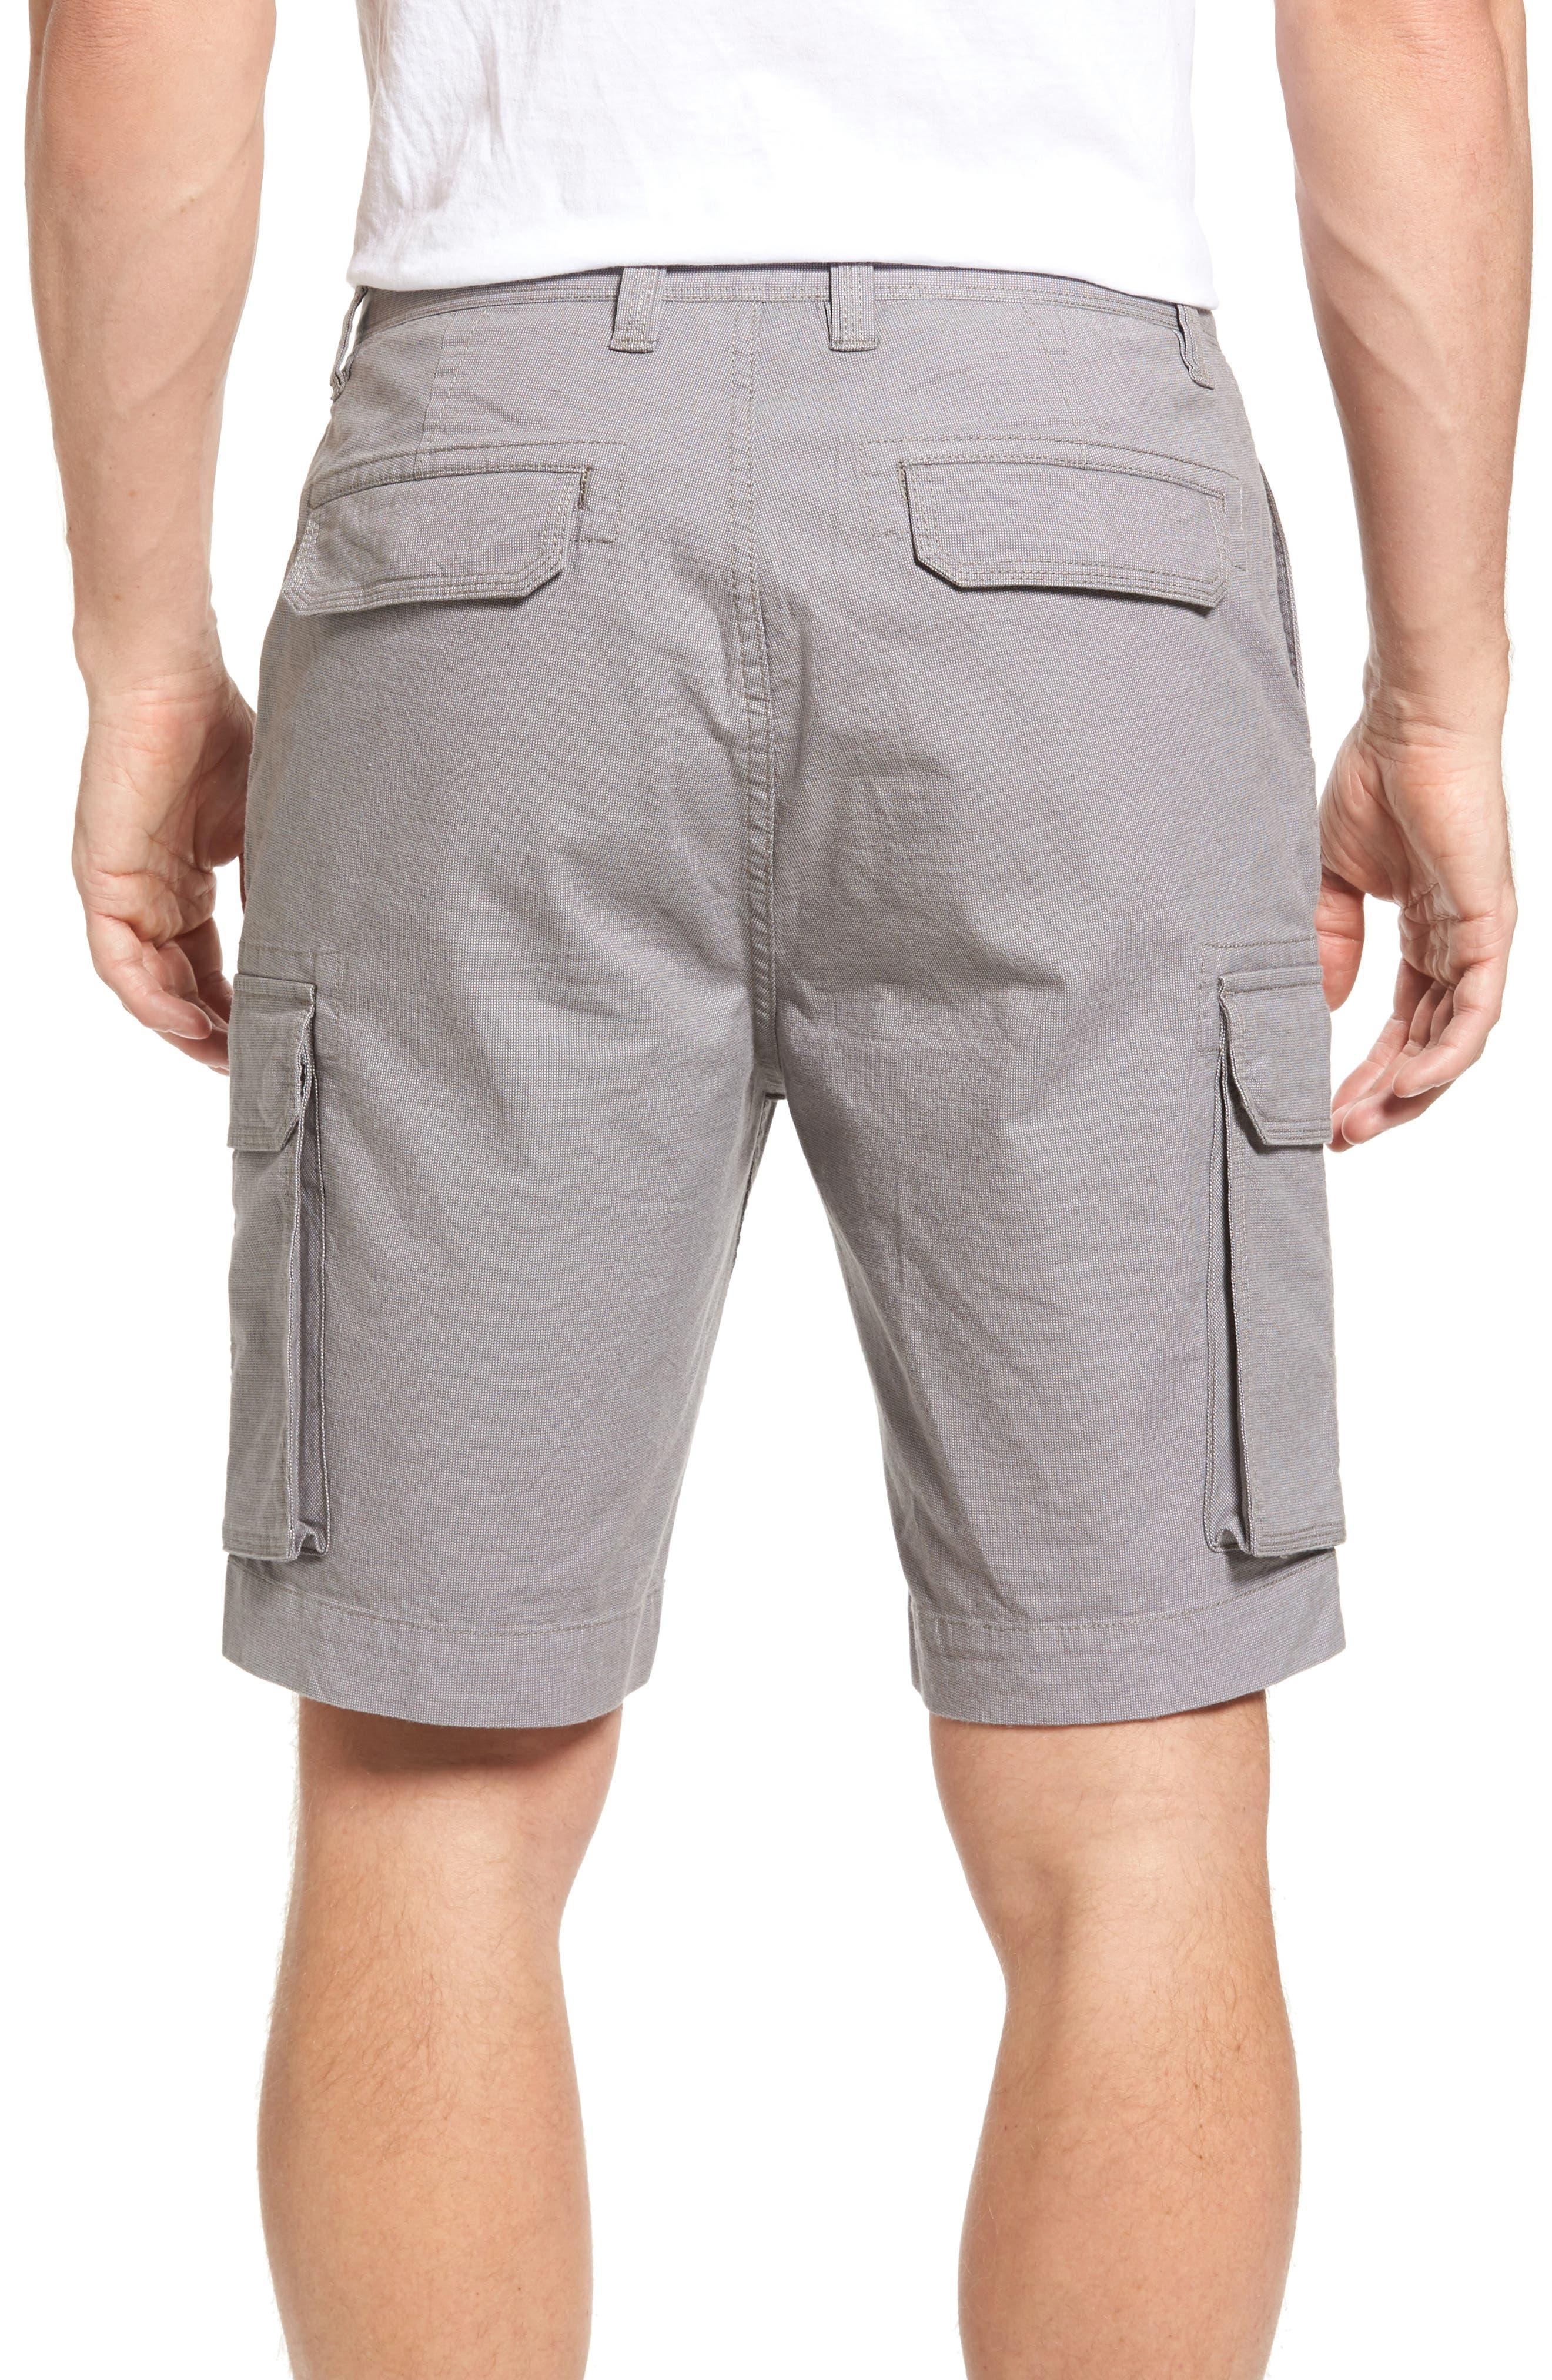 Ludstone Cargo Shorts,                             Alternate thumbnail 2, color,                             053